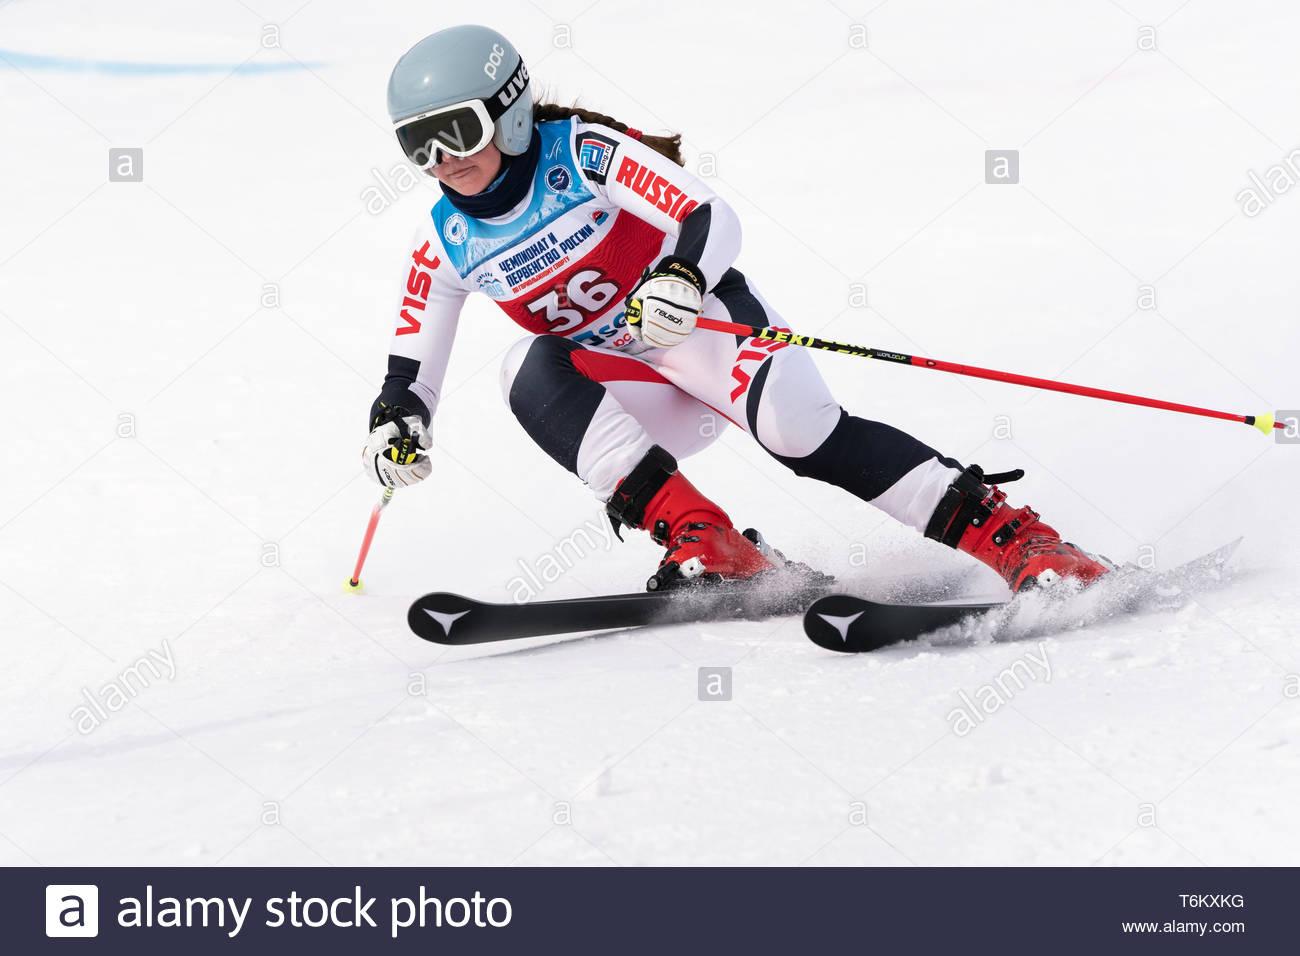 KAMCHATKA PENINSULA, RUSSIA - APRIL 2, 2019: Mountain skier Mariya Bochina (Moscow Region) skiing down mount. International Ski Federation Championshi - Stock Image